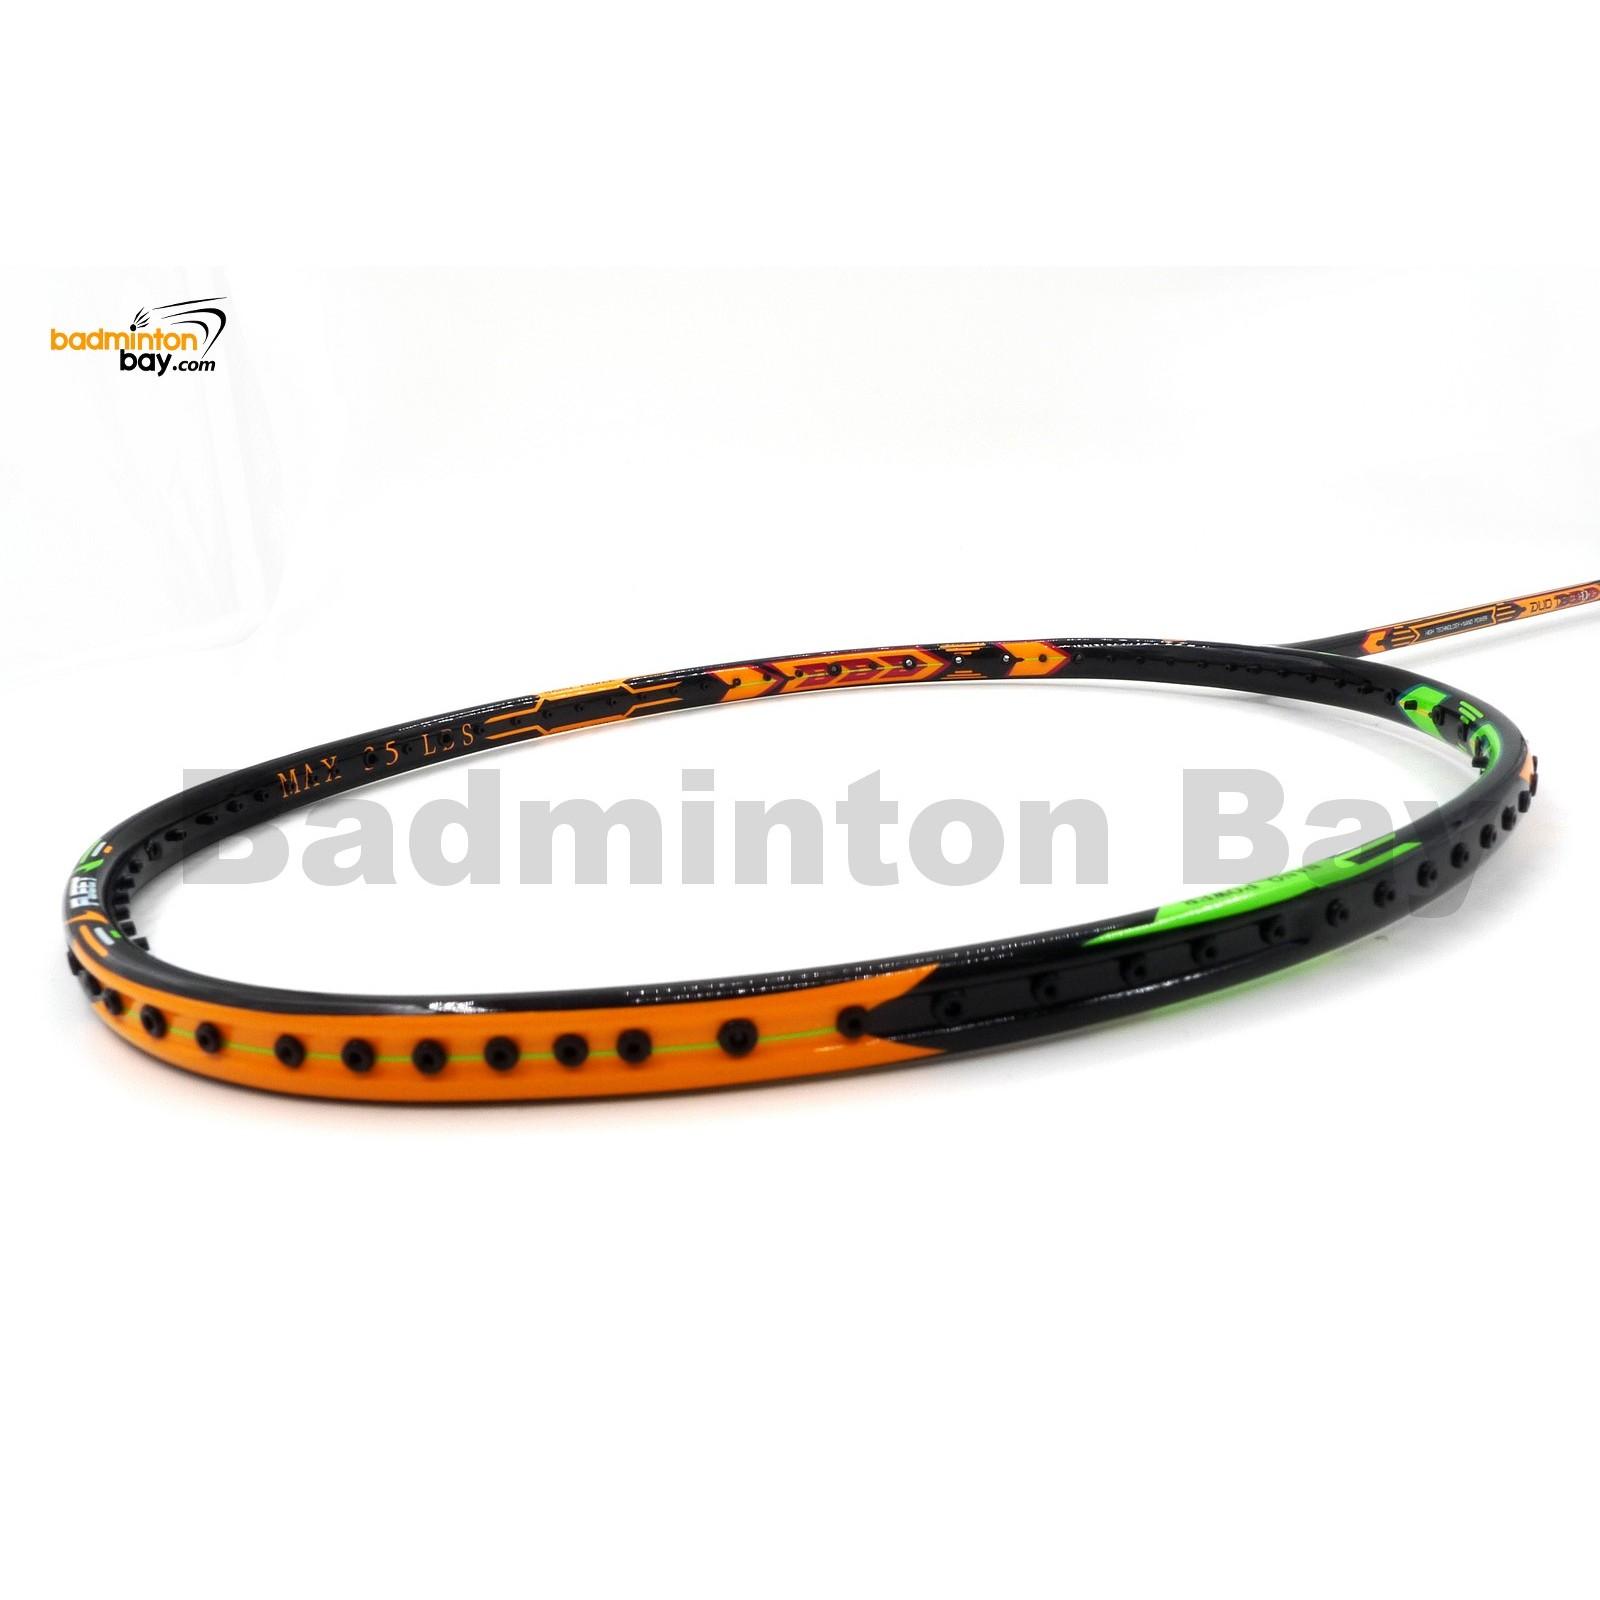 ~Out of stock Fleet Duo Tech 11 Orange Green Badminton ...